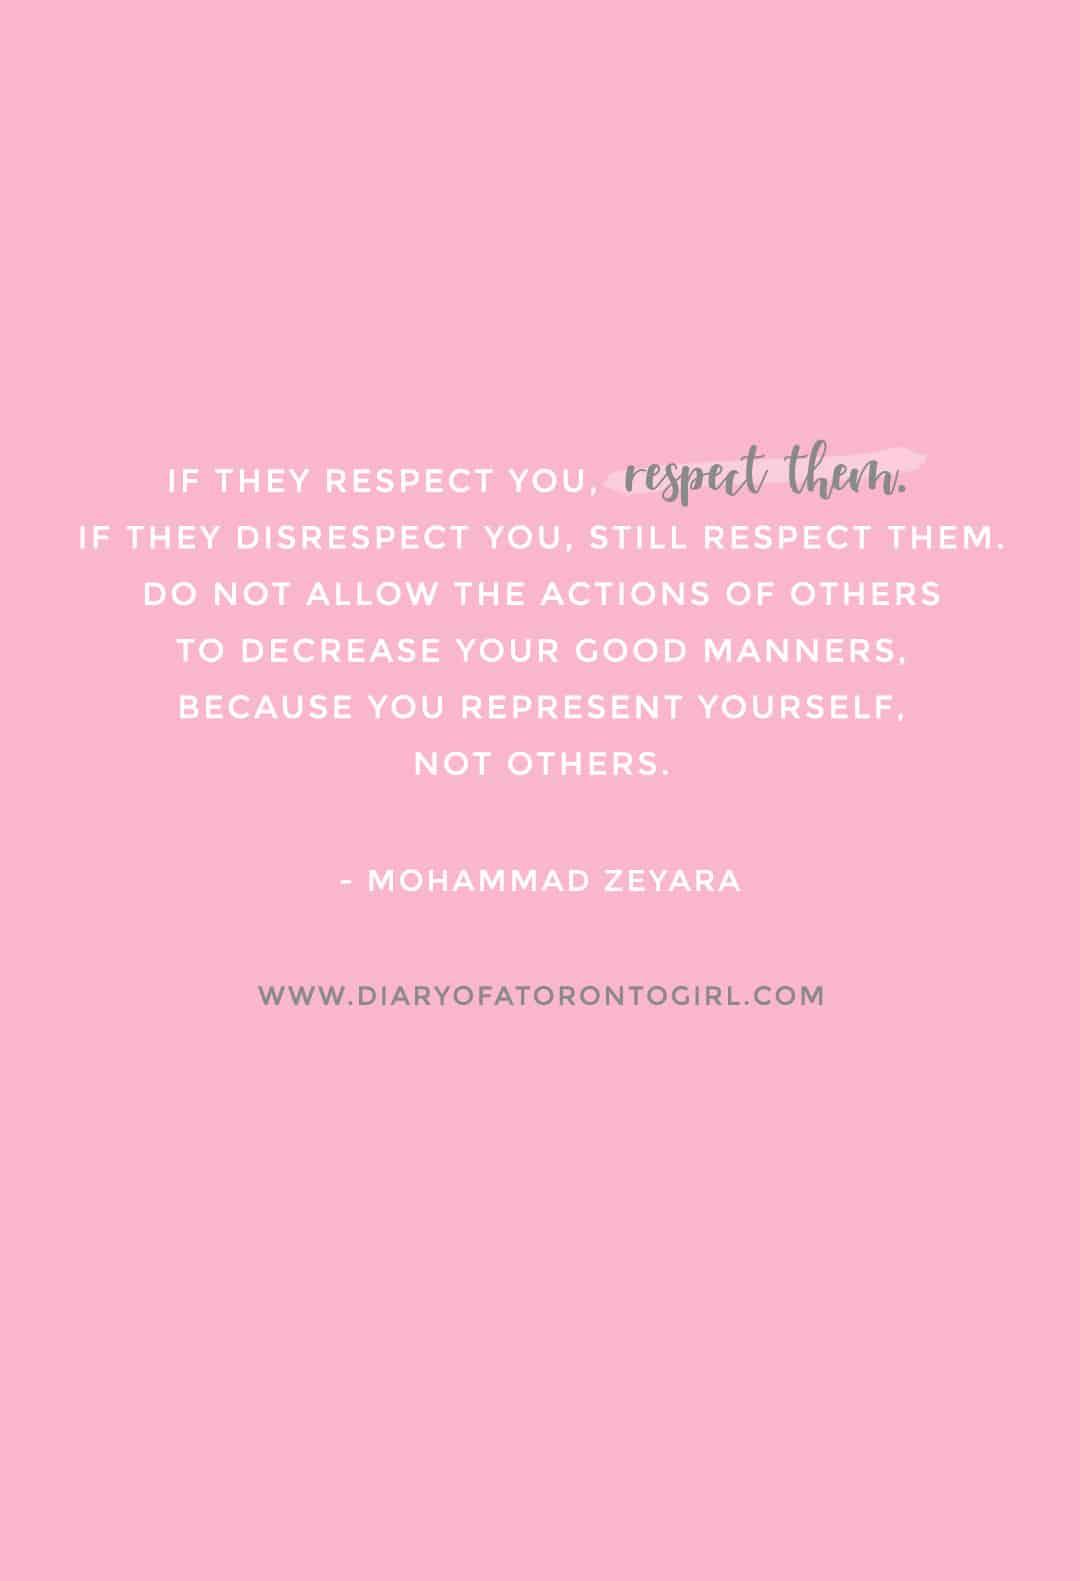 Mohammad Zeyara inspirational quote